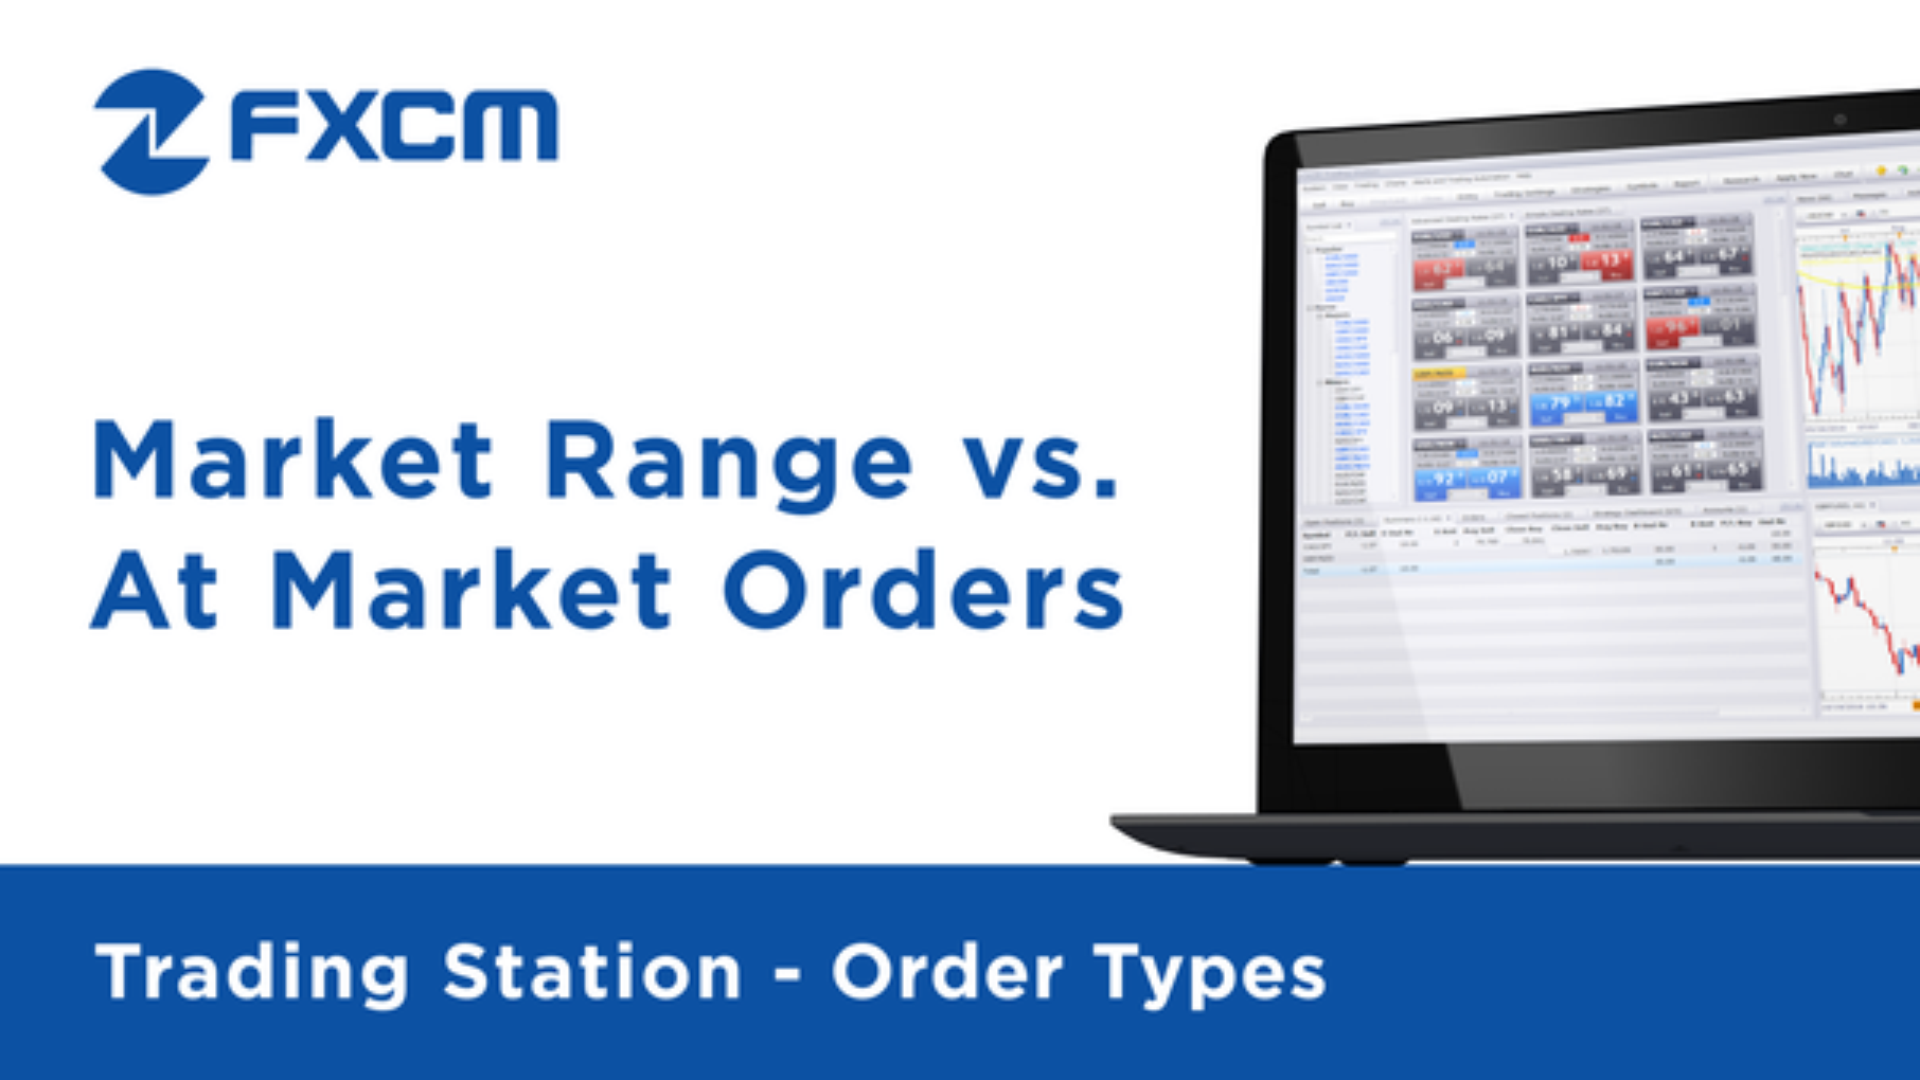 At Market vs. Market Range